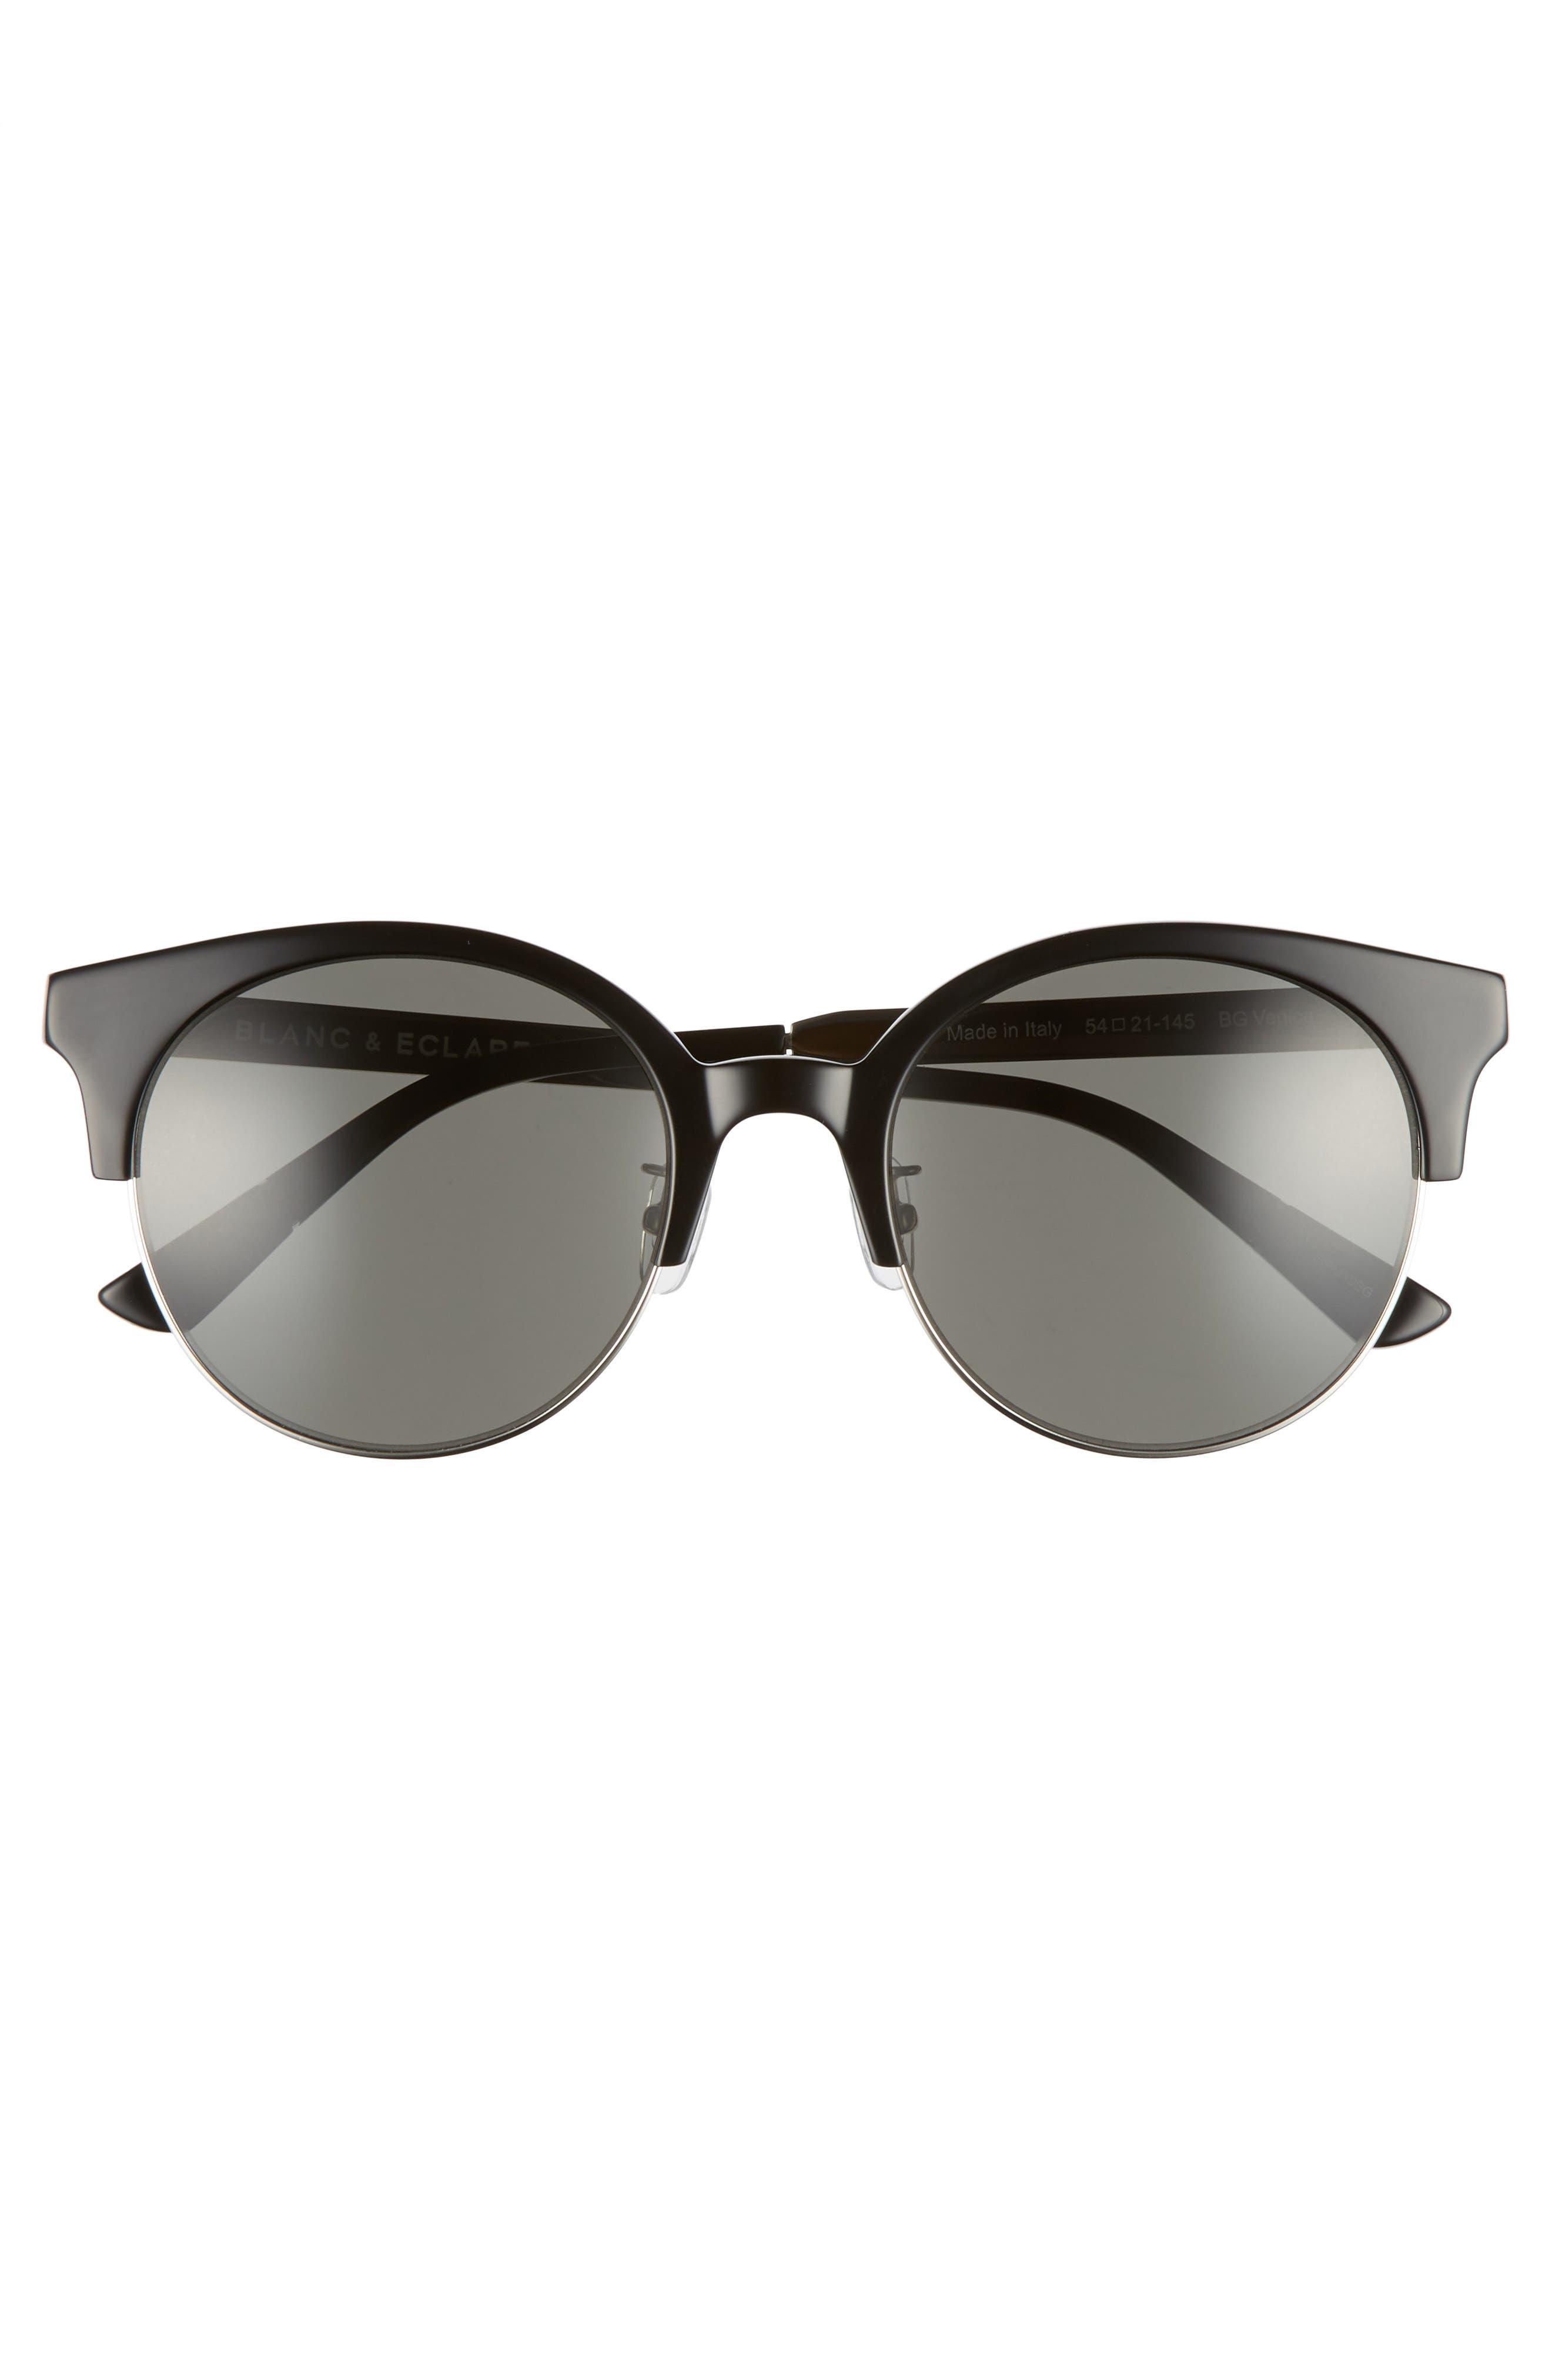 BLANC & ECLARE Venice Round Sunglasses,                             Alternate thumbnail 5, color,